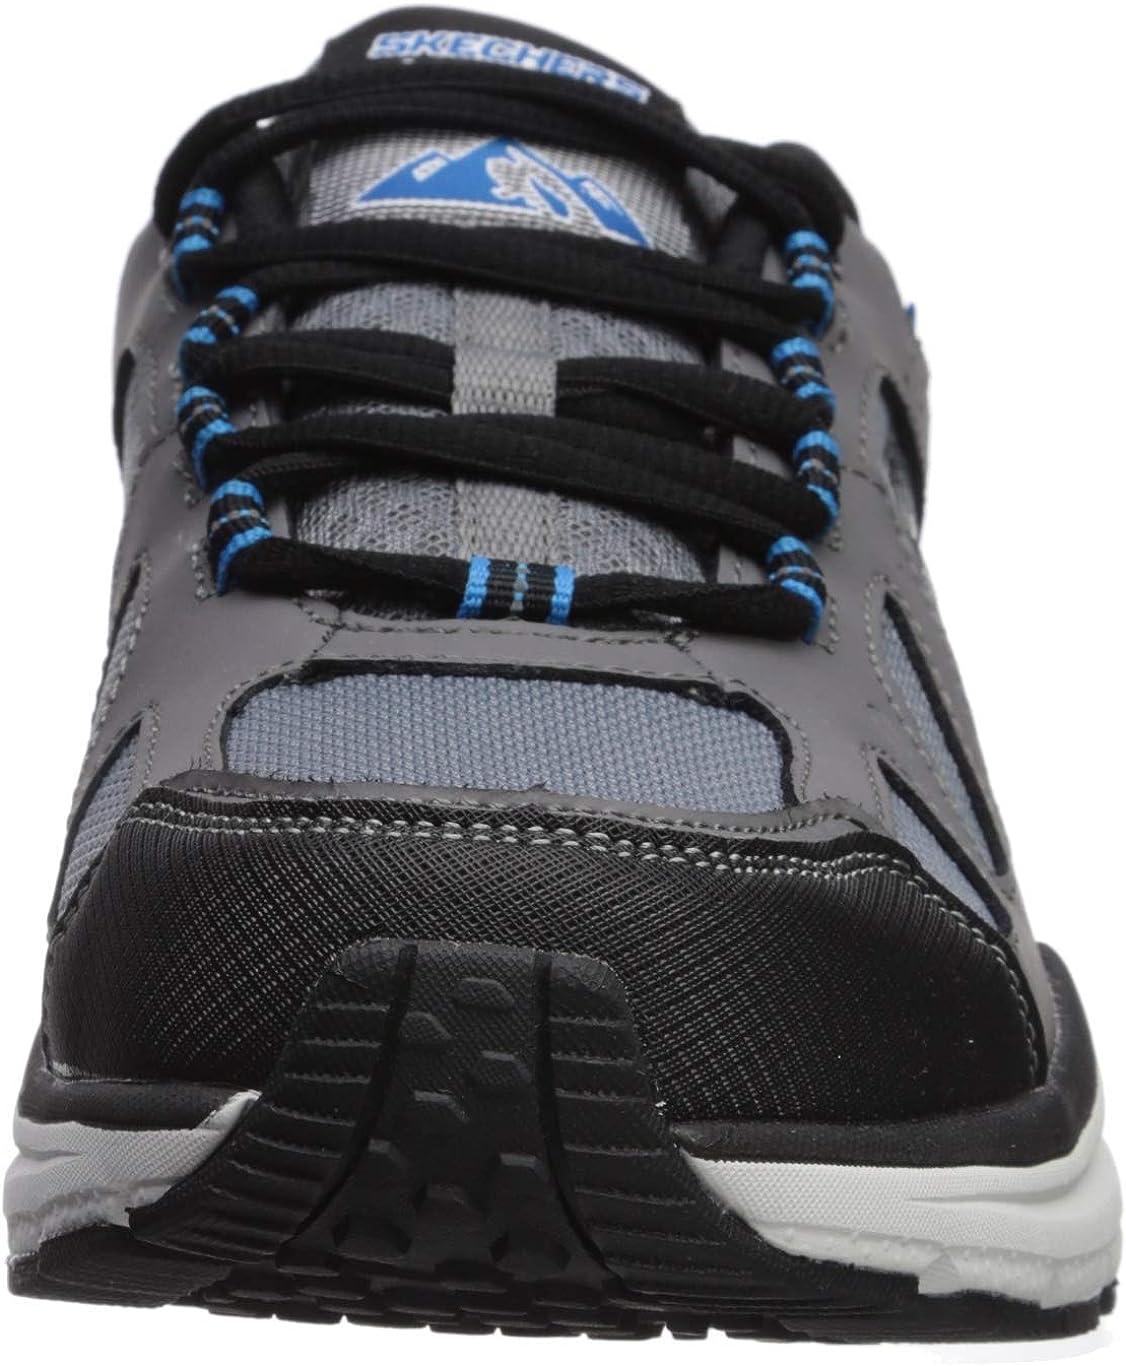 Skechers mens 51703 Escape Plan 2.0 Mueldor Charcoal Black